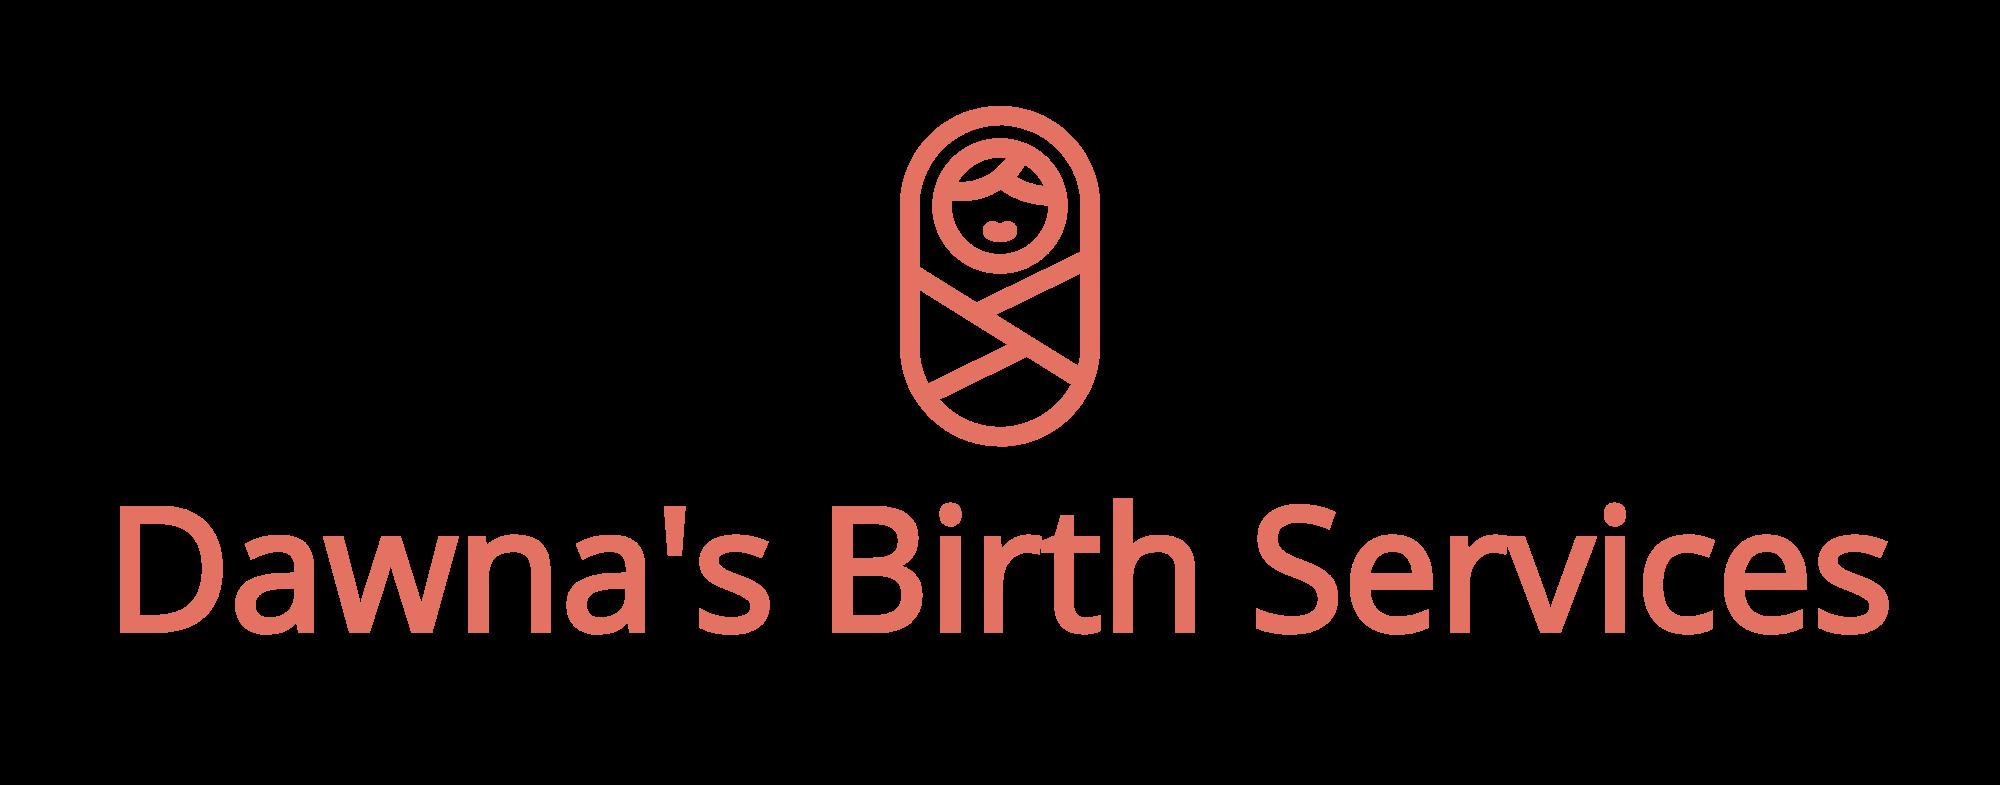 Dawna_s Birth Services-logo.png